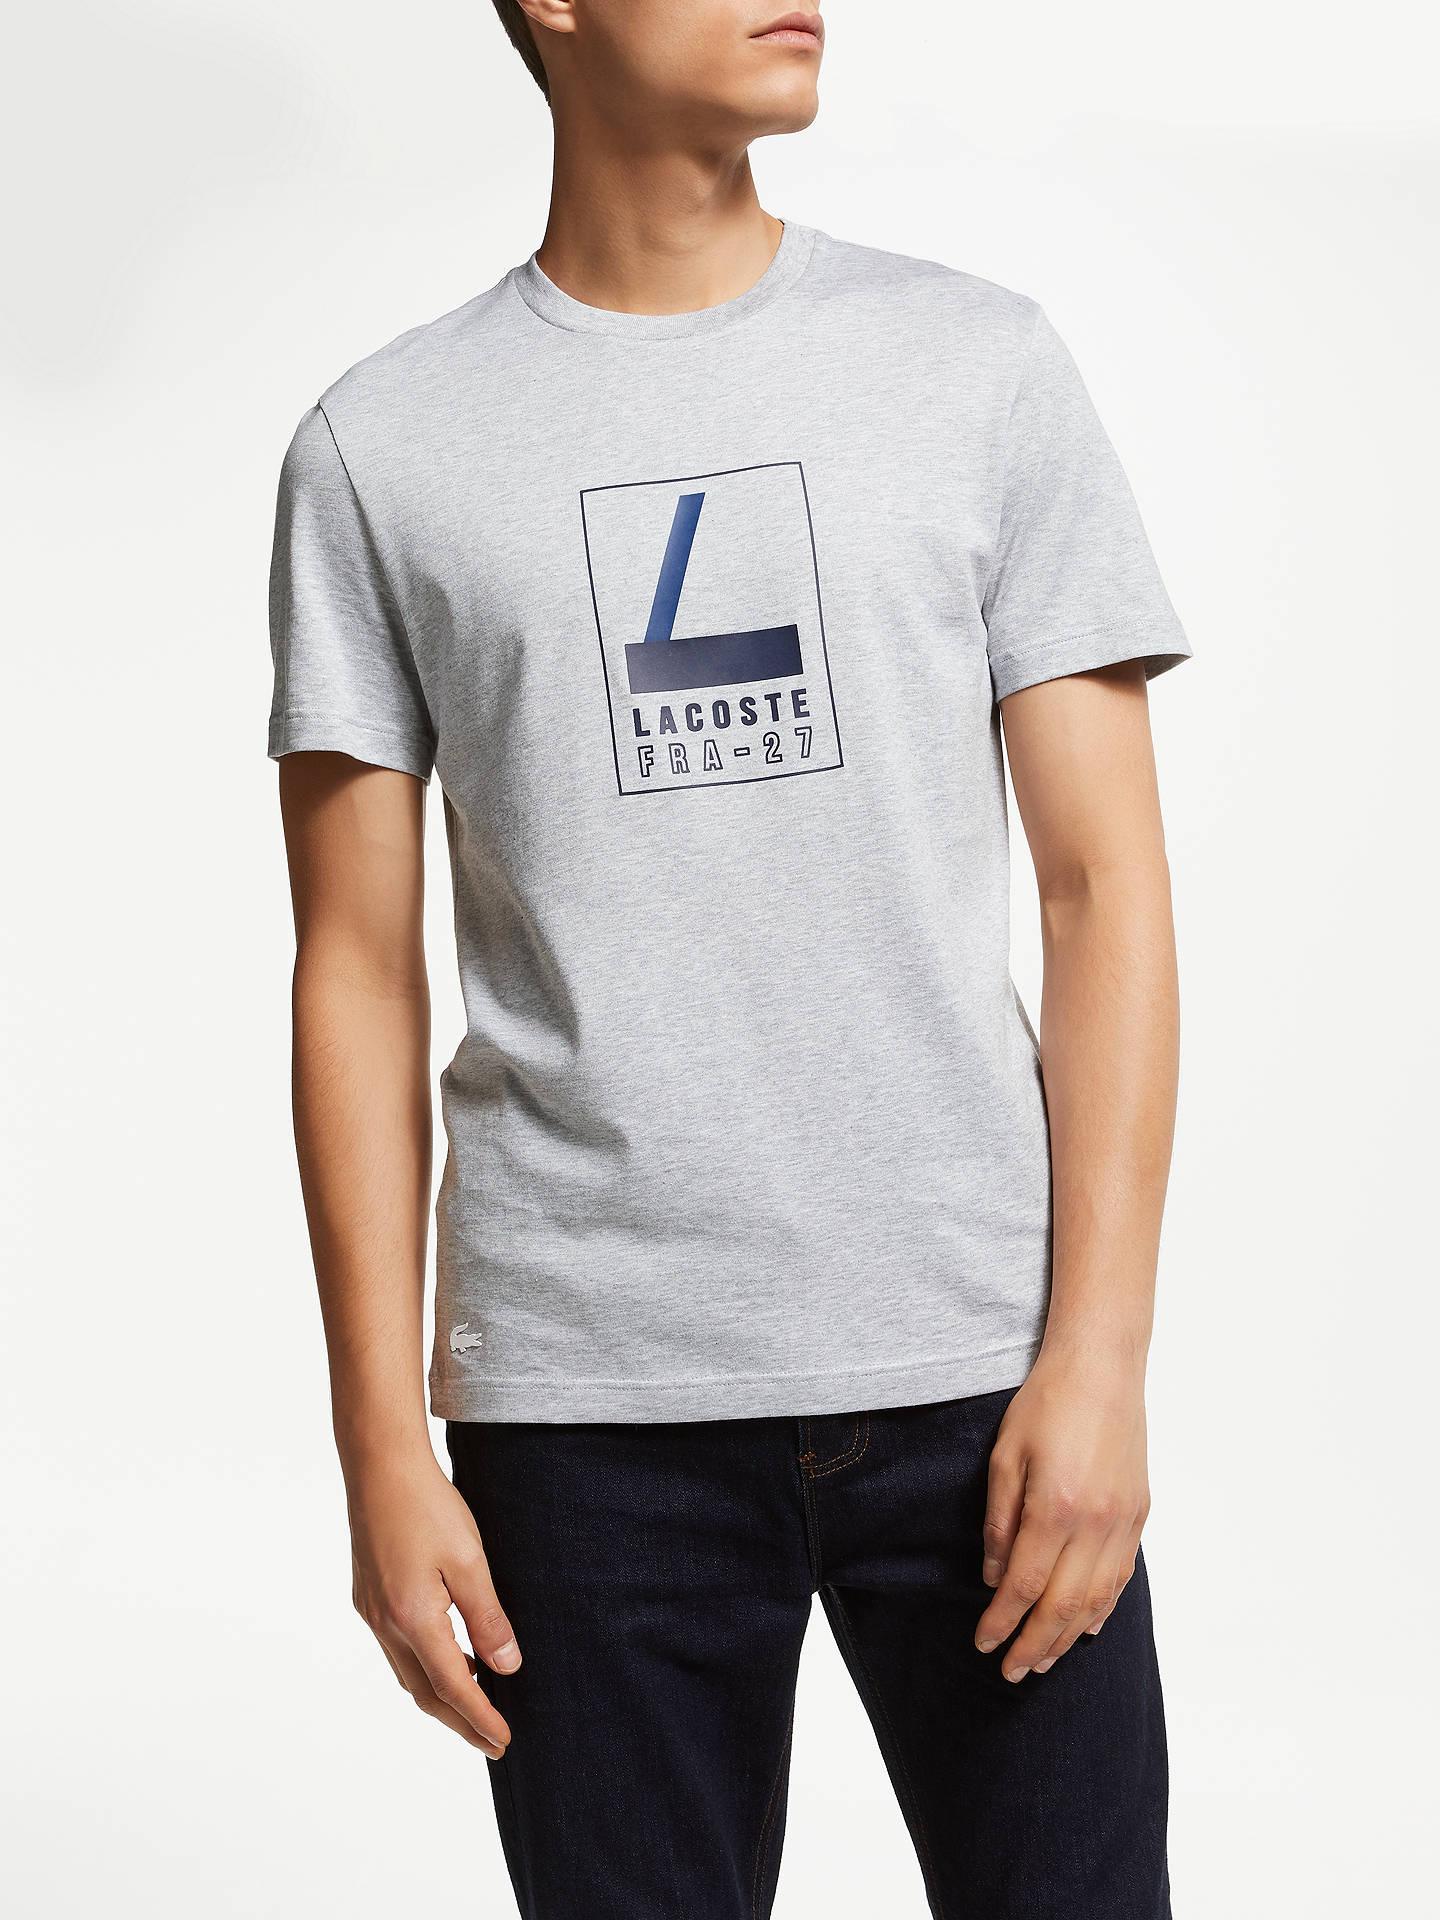 978ab14b24237d Buy Lacoste Short Sleeve Abstract Croc Logo T-Shirt